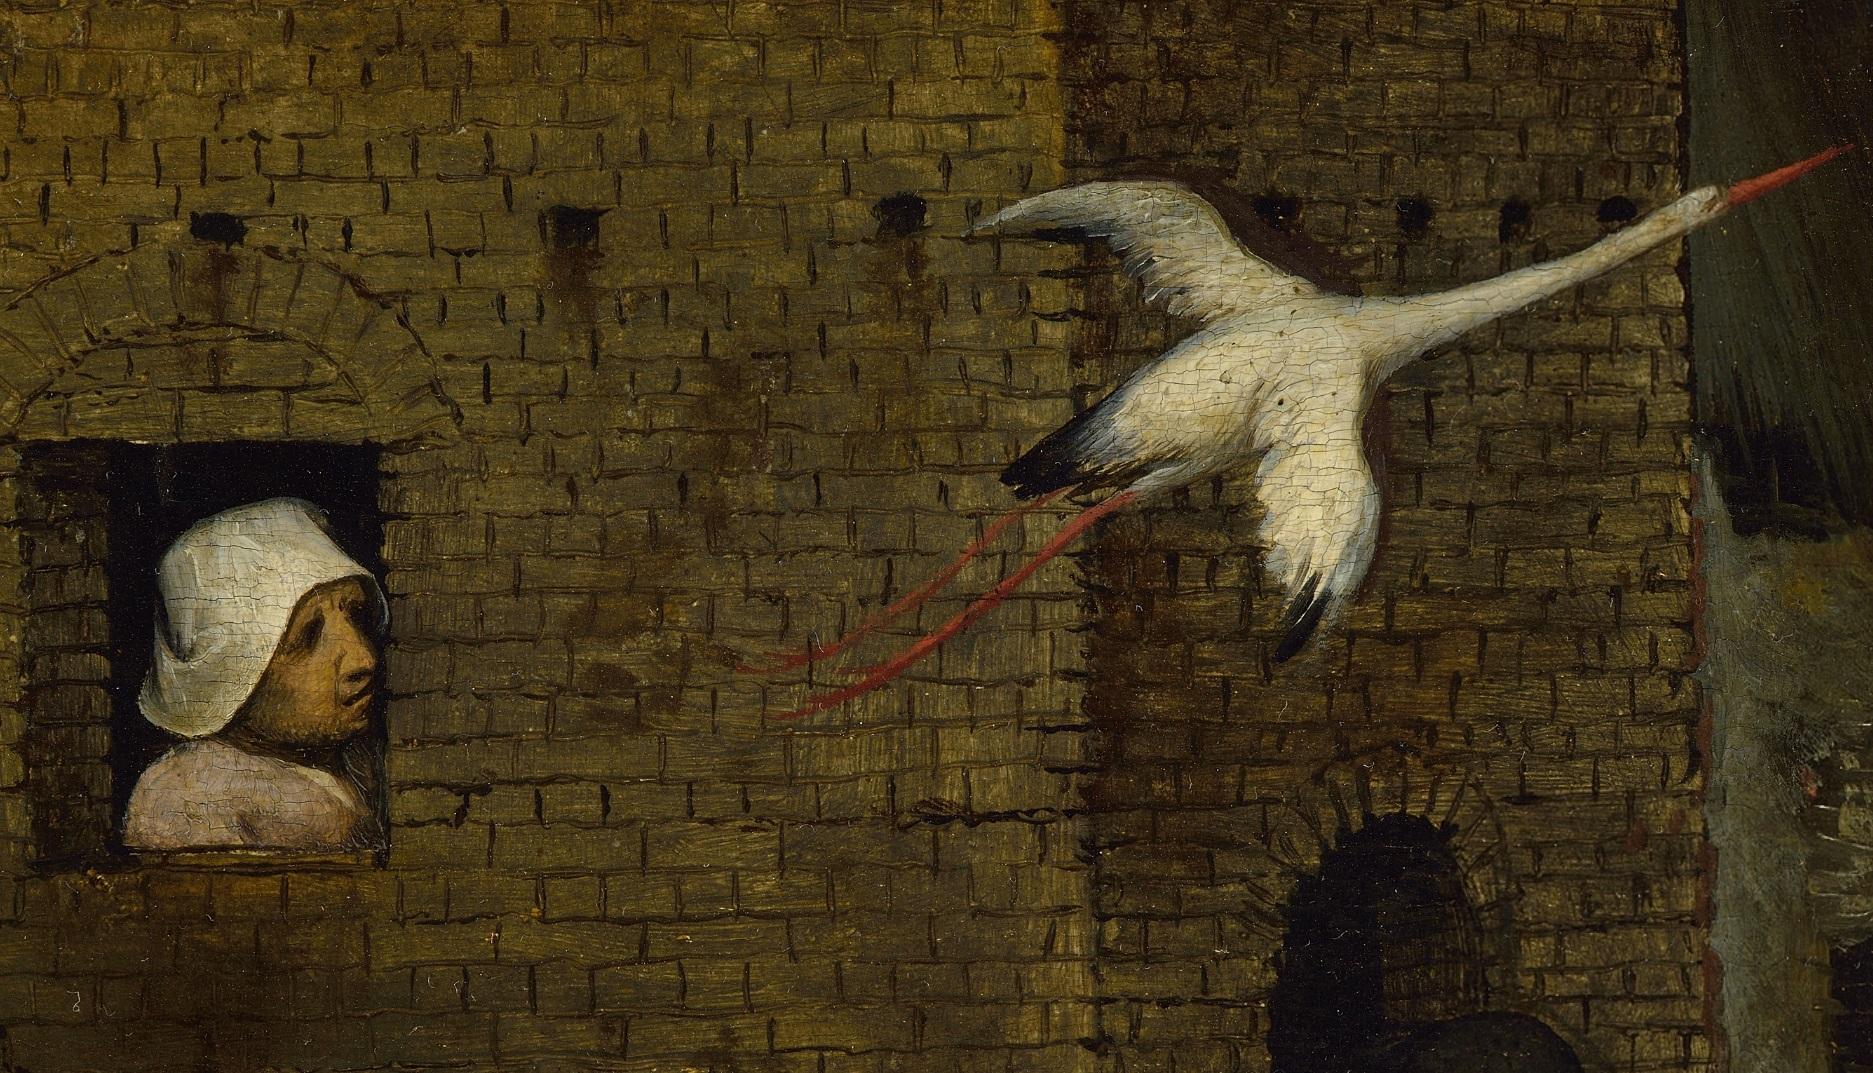 brueghel-proverbs-017.jpg